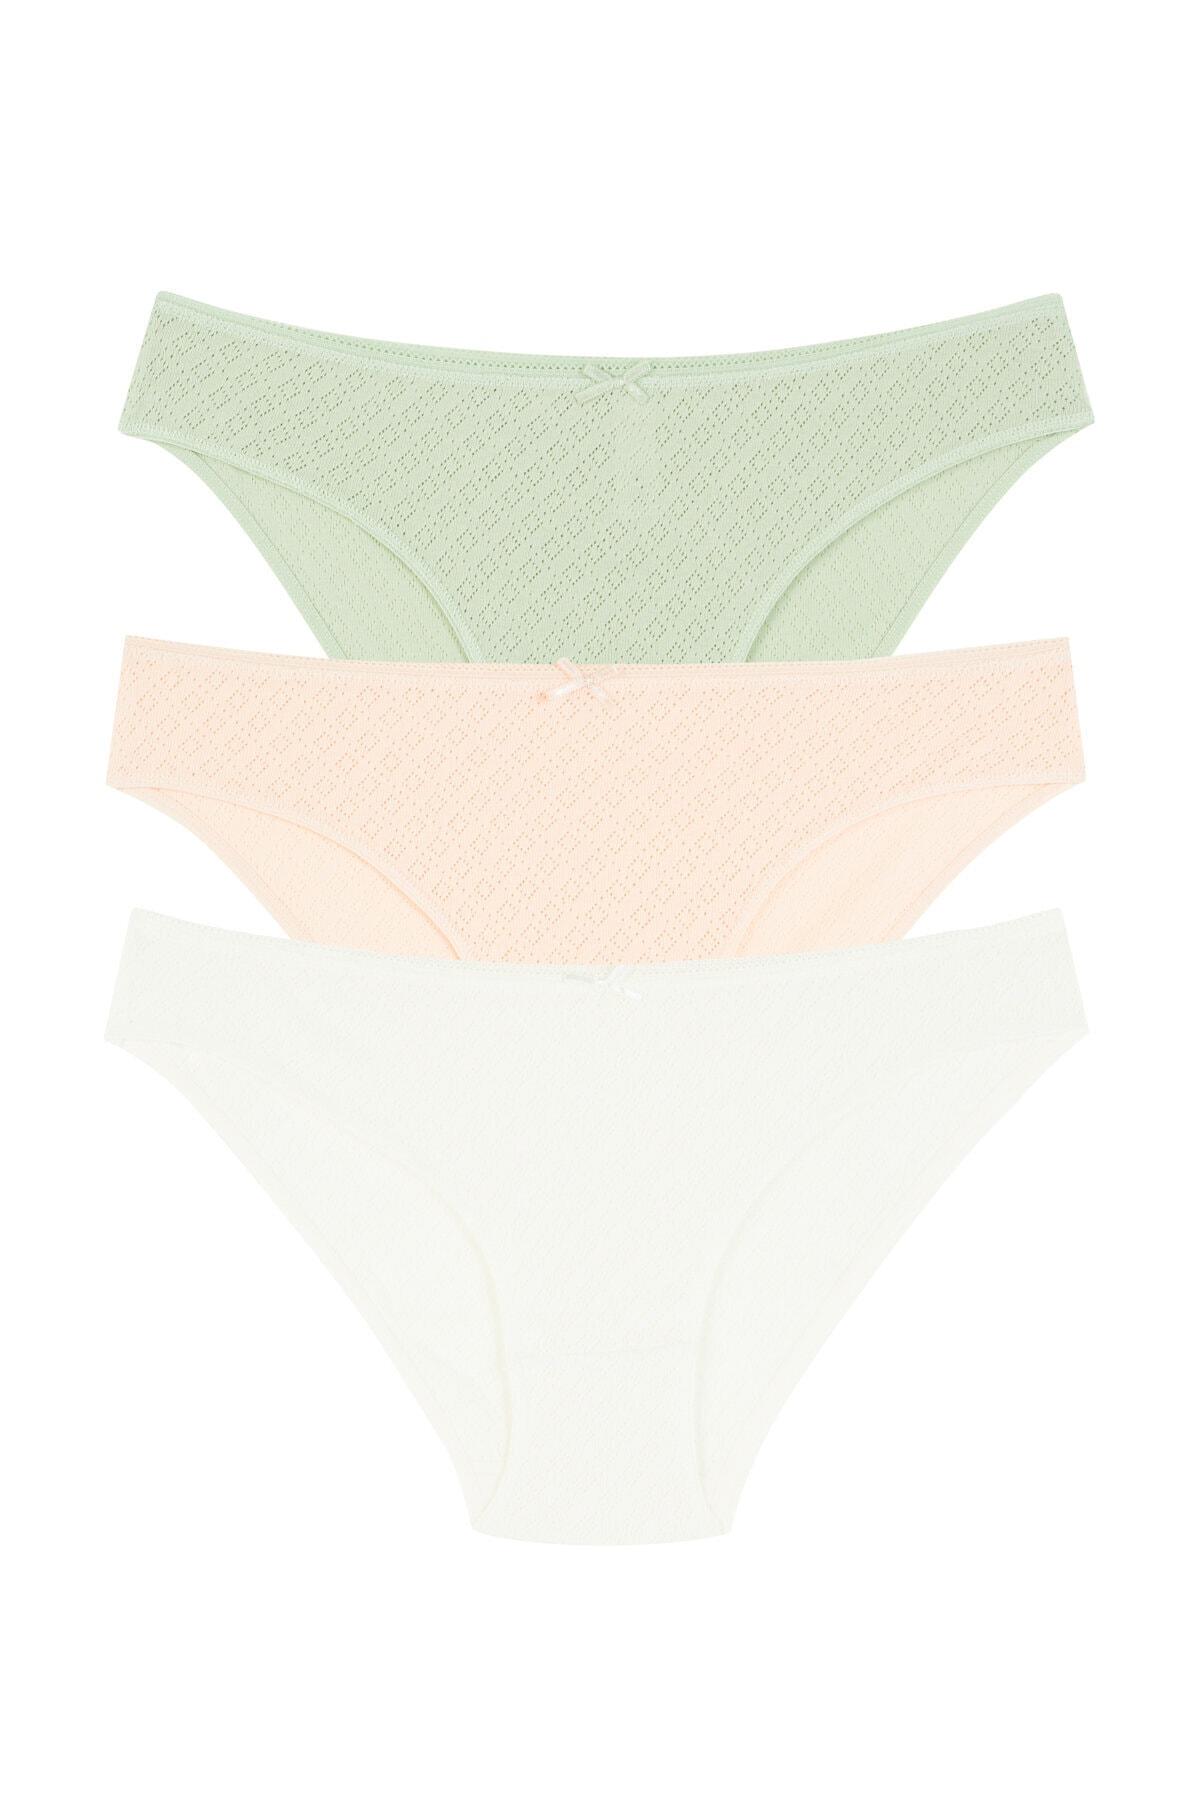 Penti Kadın Çok Renkli Soft Pointel Pure 3Lü Slip Külot